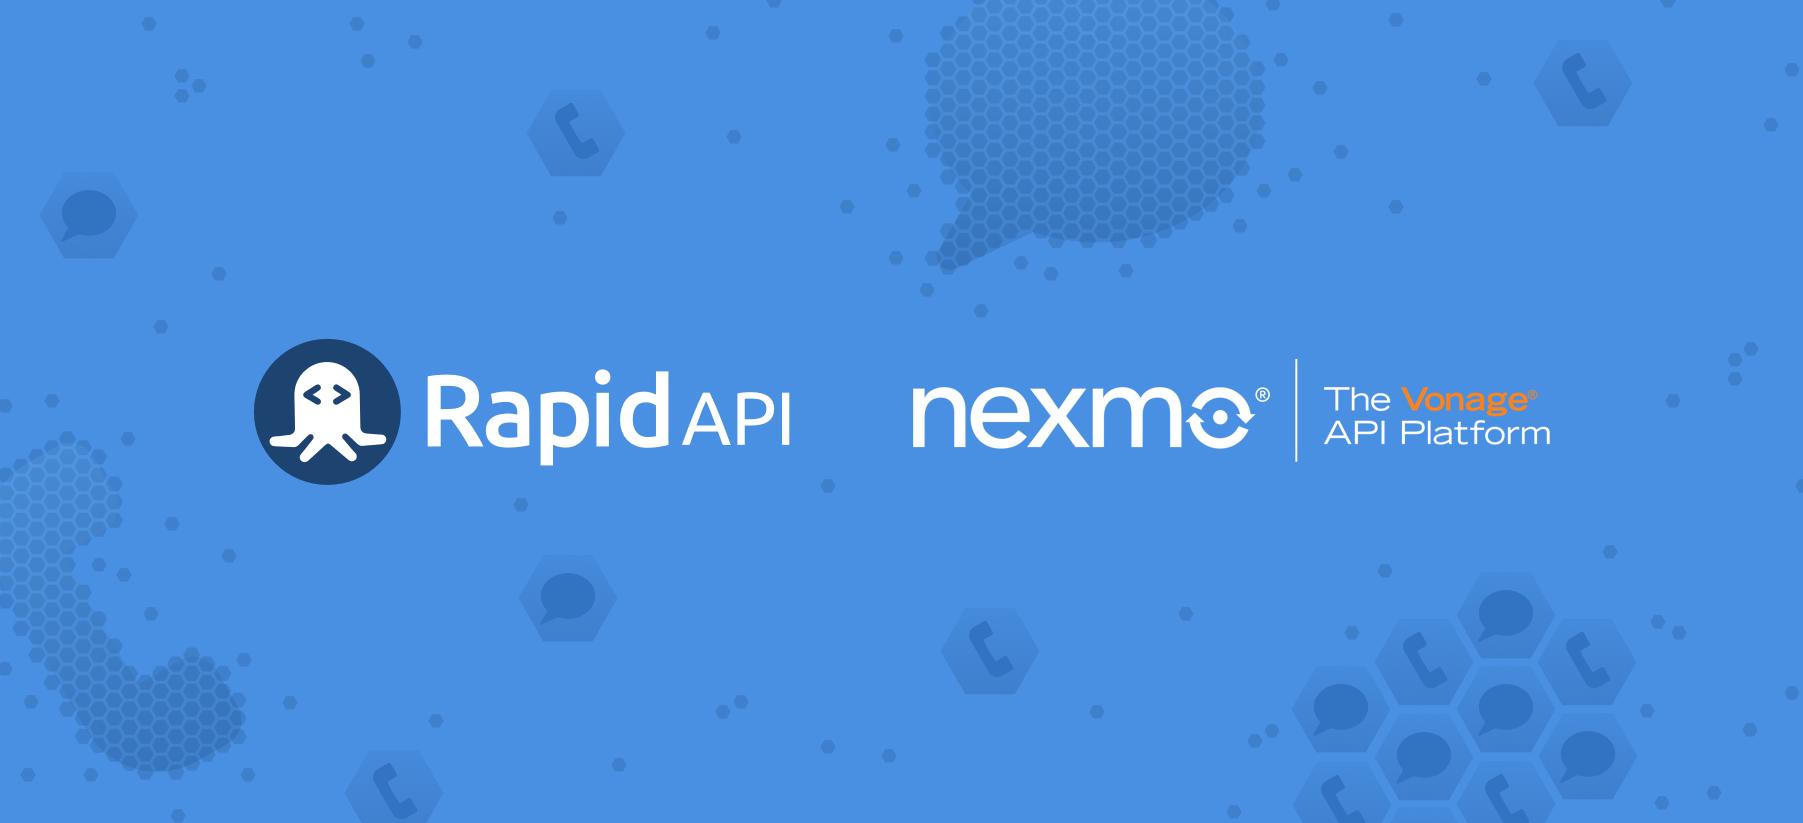 Nexmo APIs on RapidAPI.com